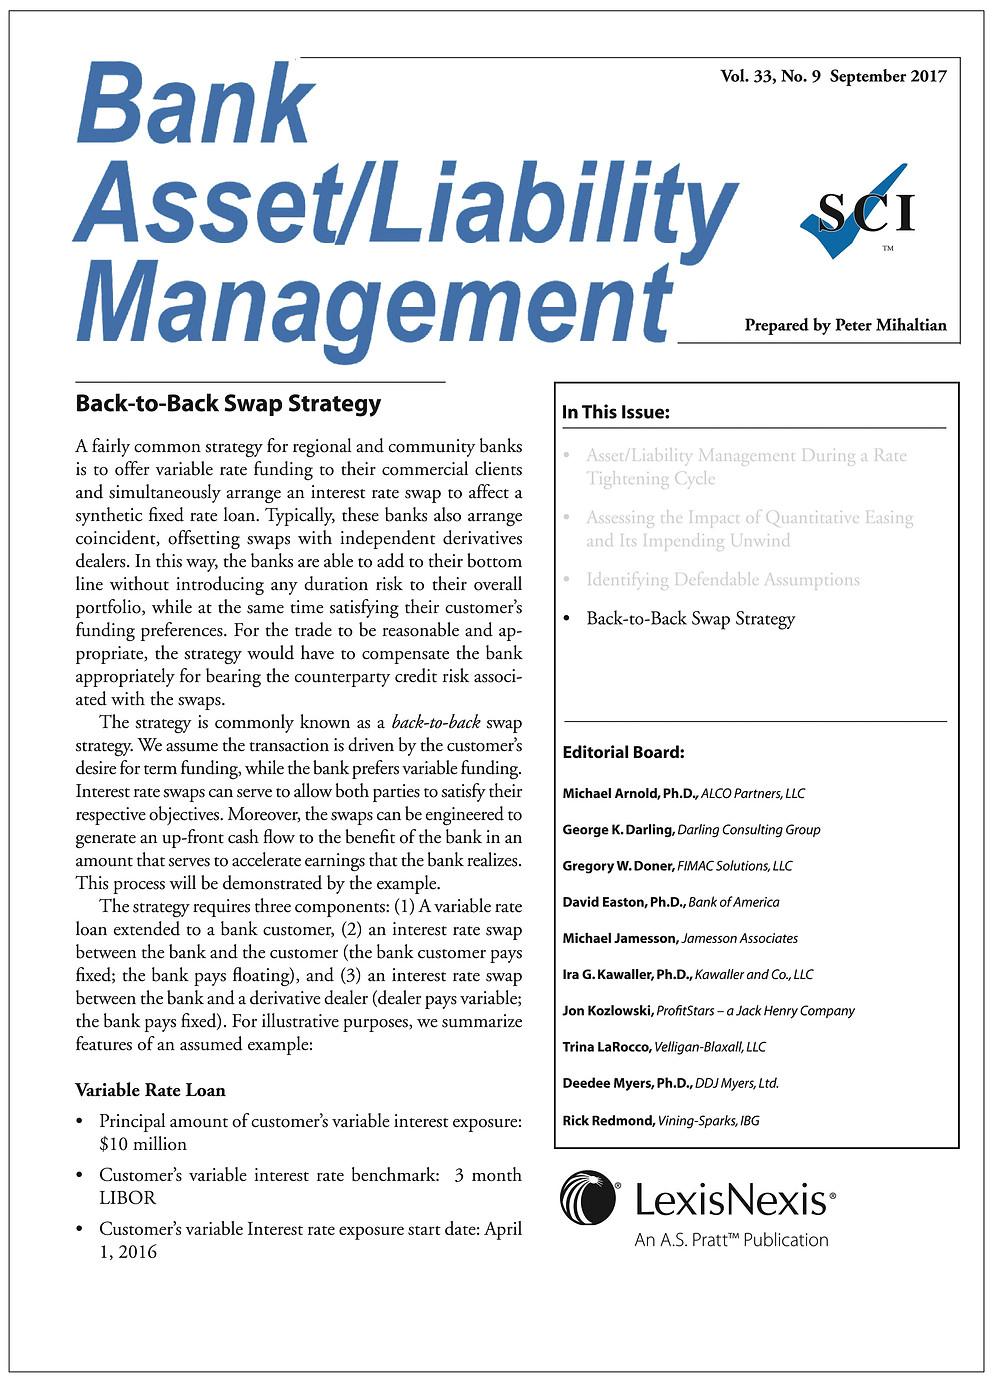 Bank Asset Liability Management